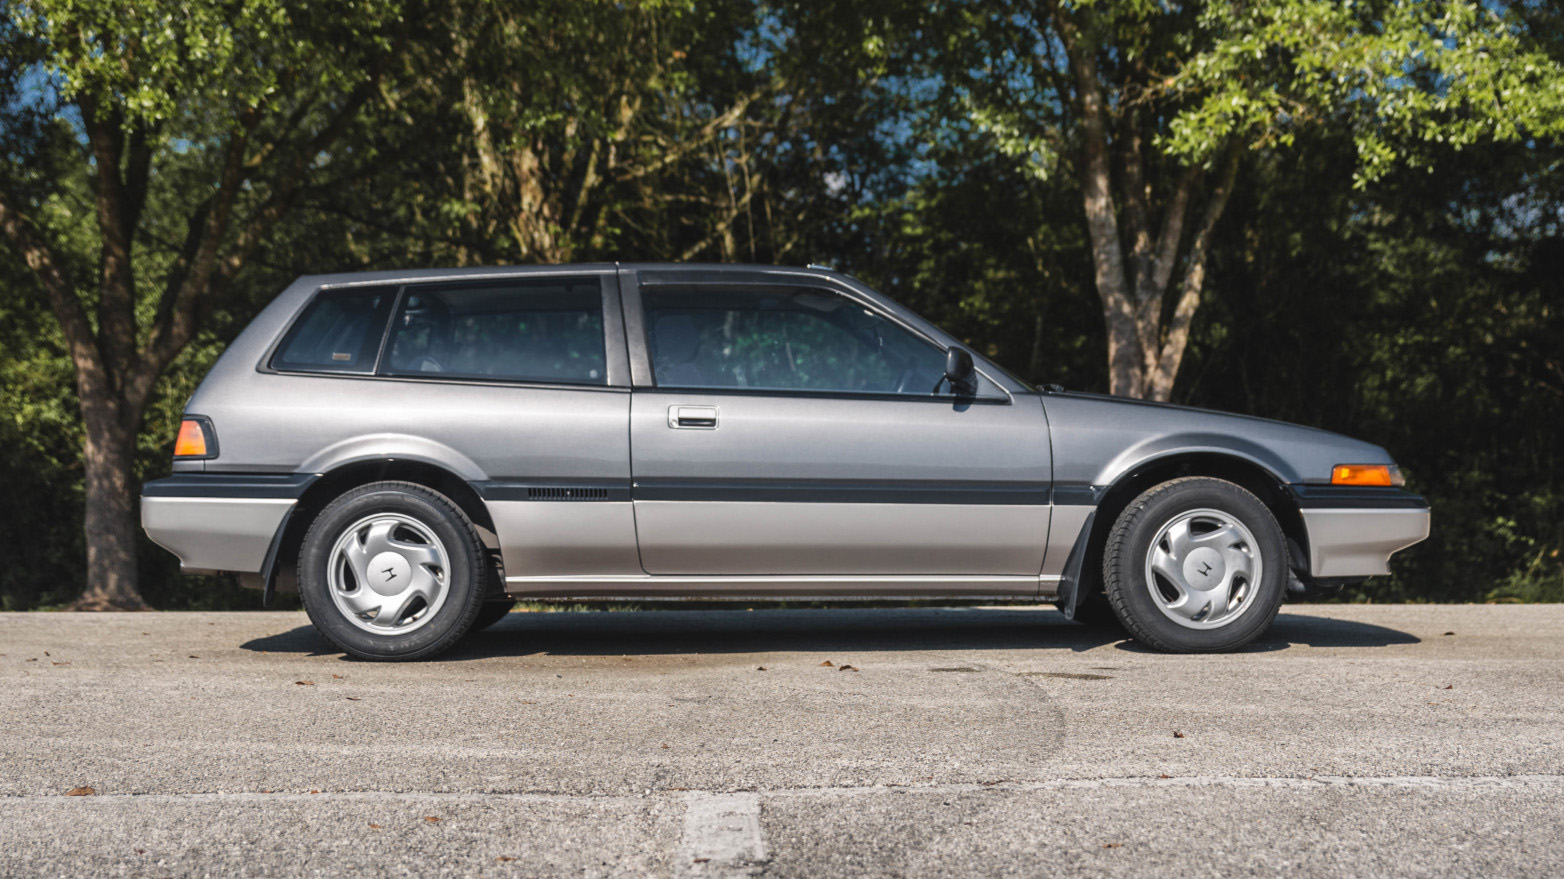 1986 Honda Accord AeroDeck for sale on Bring a Trailer | Autoblog